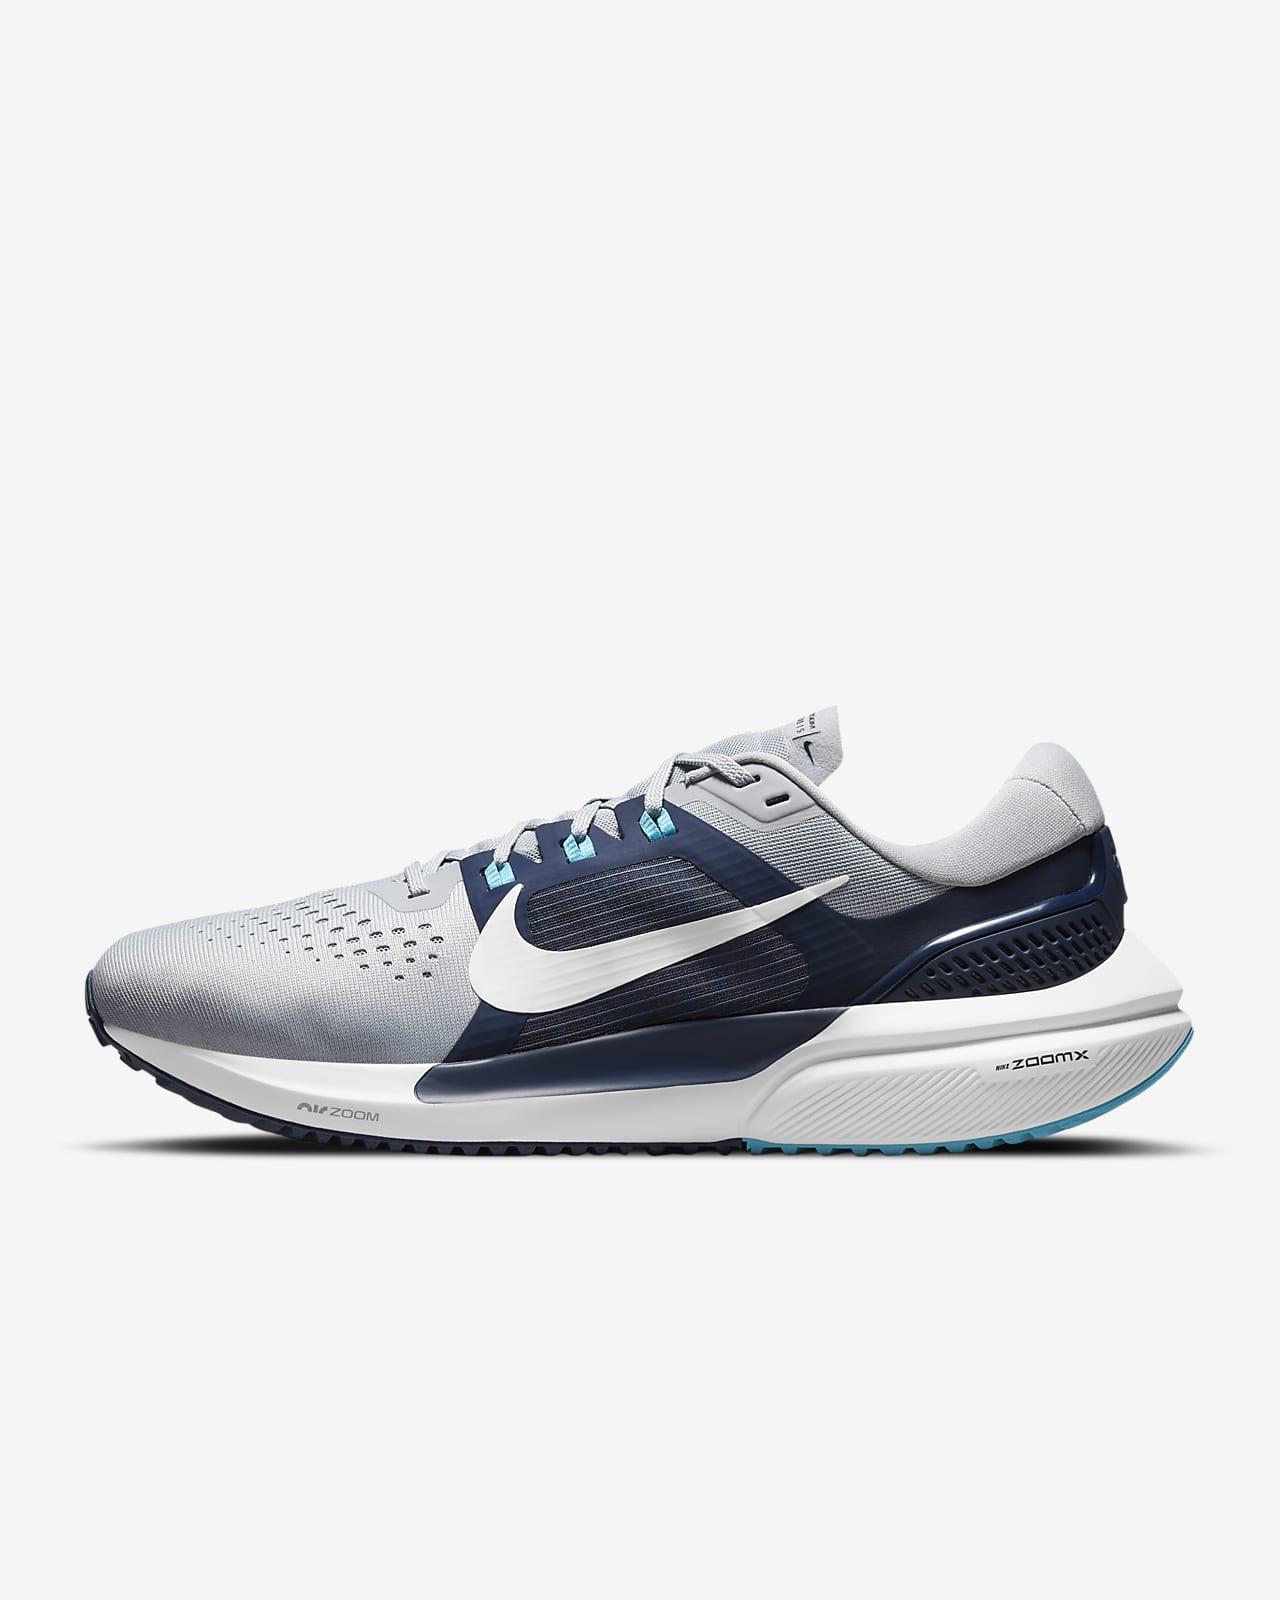 Sapatilhas de running Nike Air Zoom Vomero 15 para homem